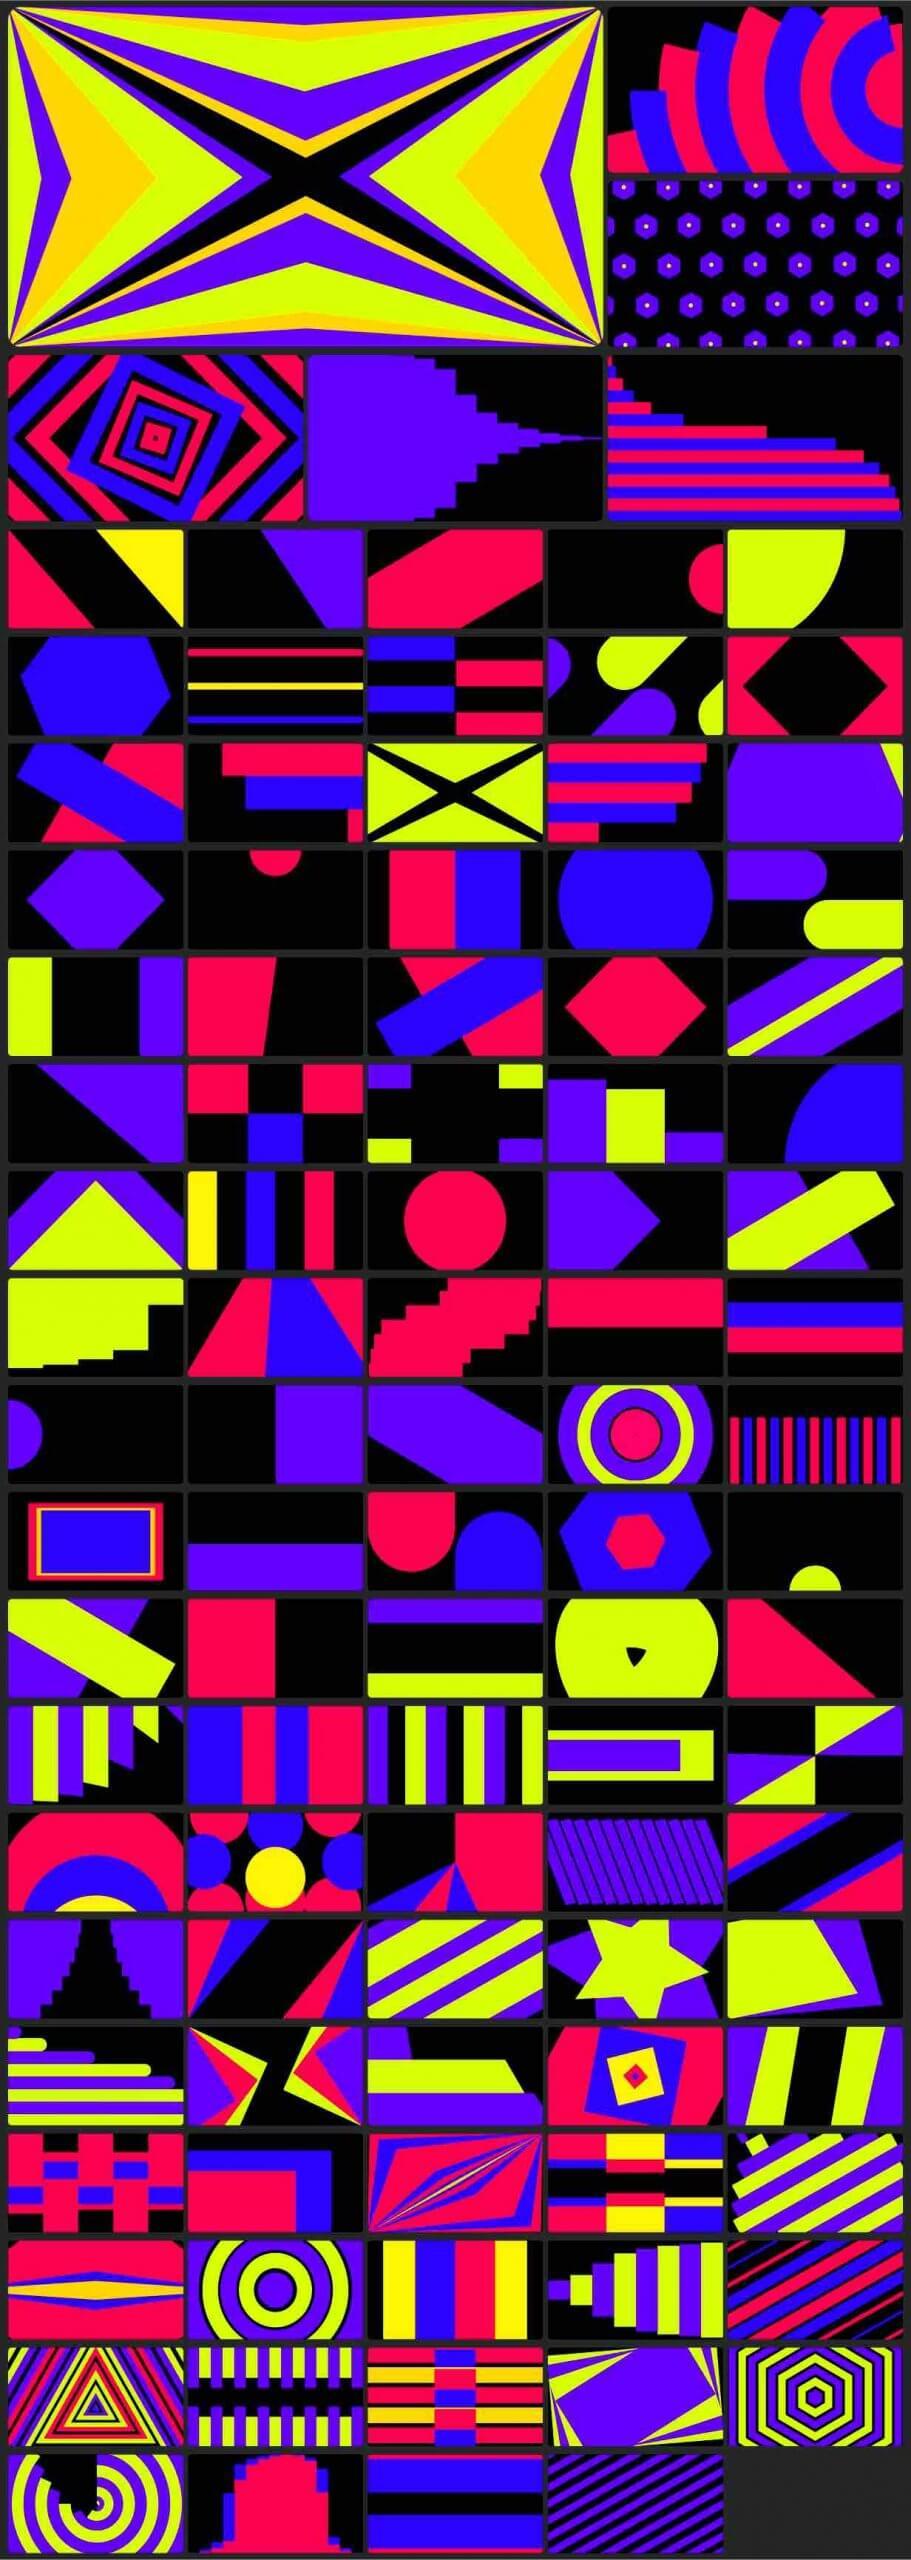 AE模板-2200+效果工具图形库 Graphics Pack插图17